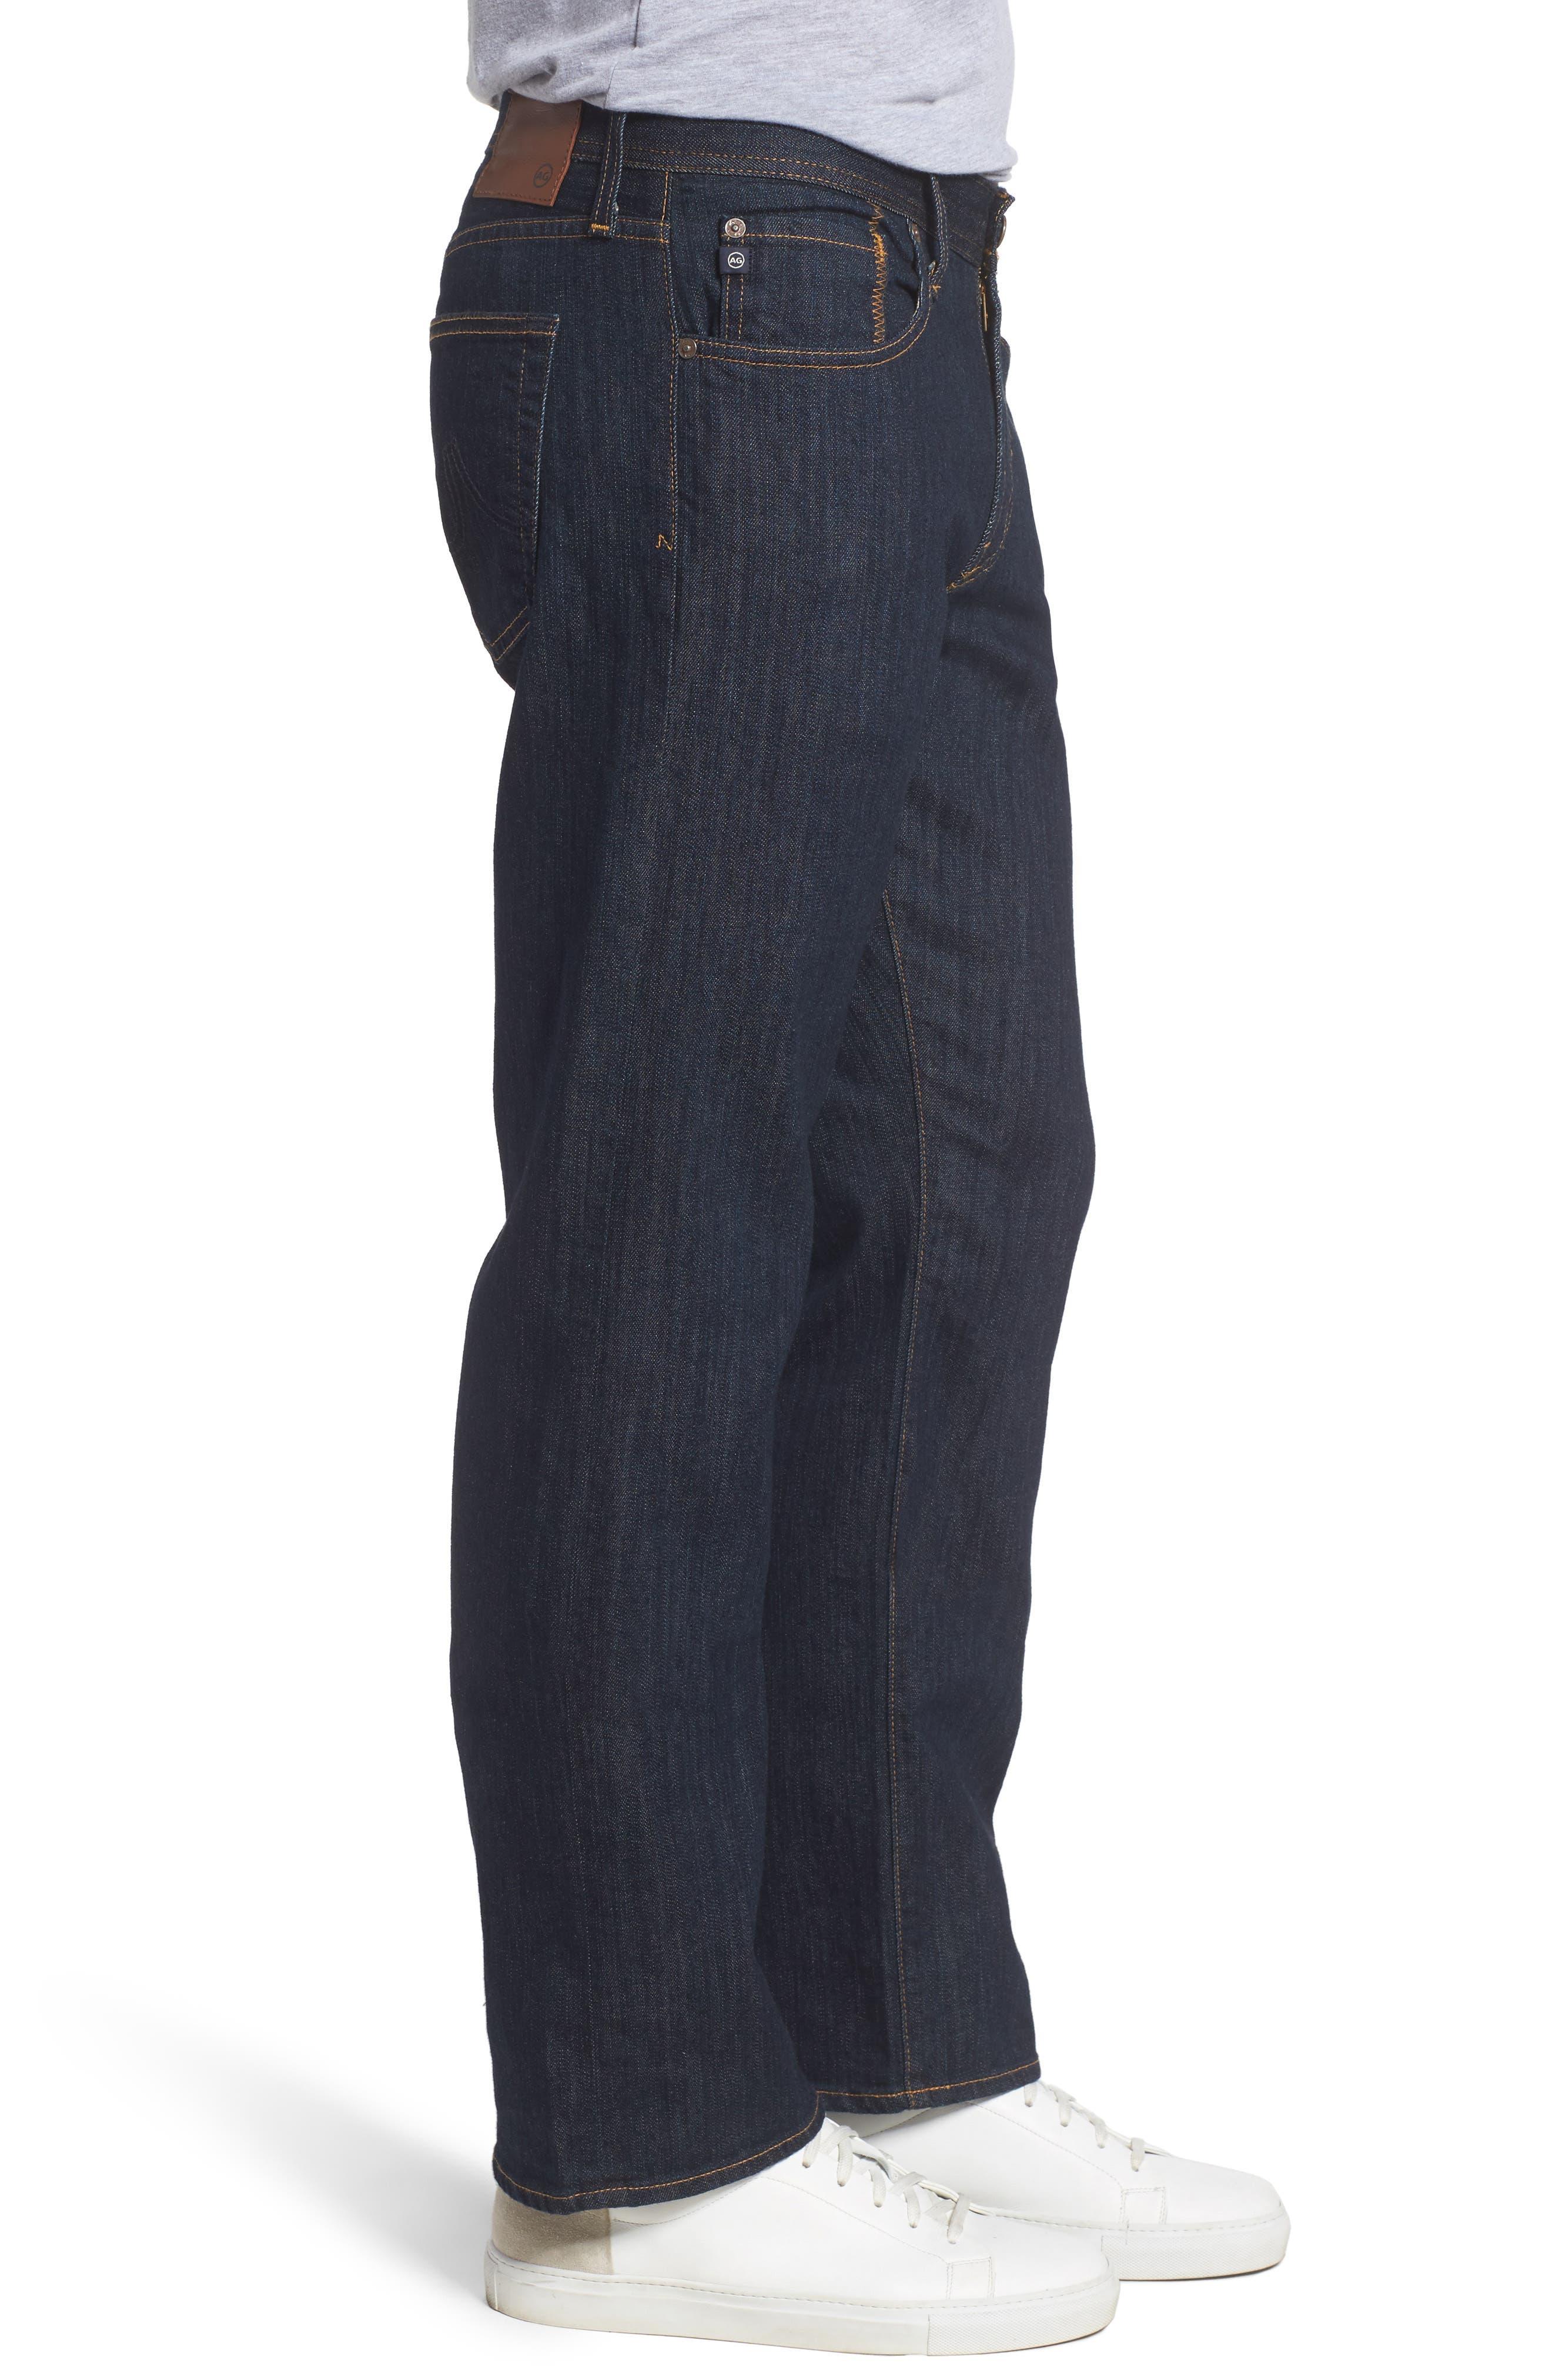 'Protégé' Straight Leg Jeans,                             Alternate thumbnail 3, color,                             016